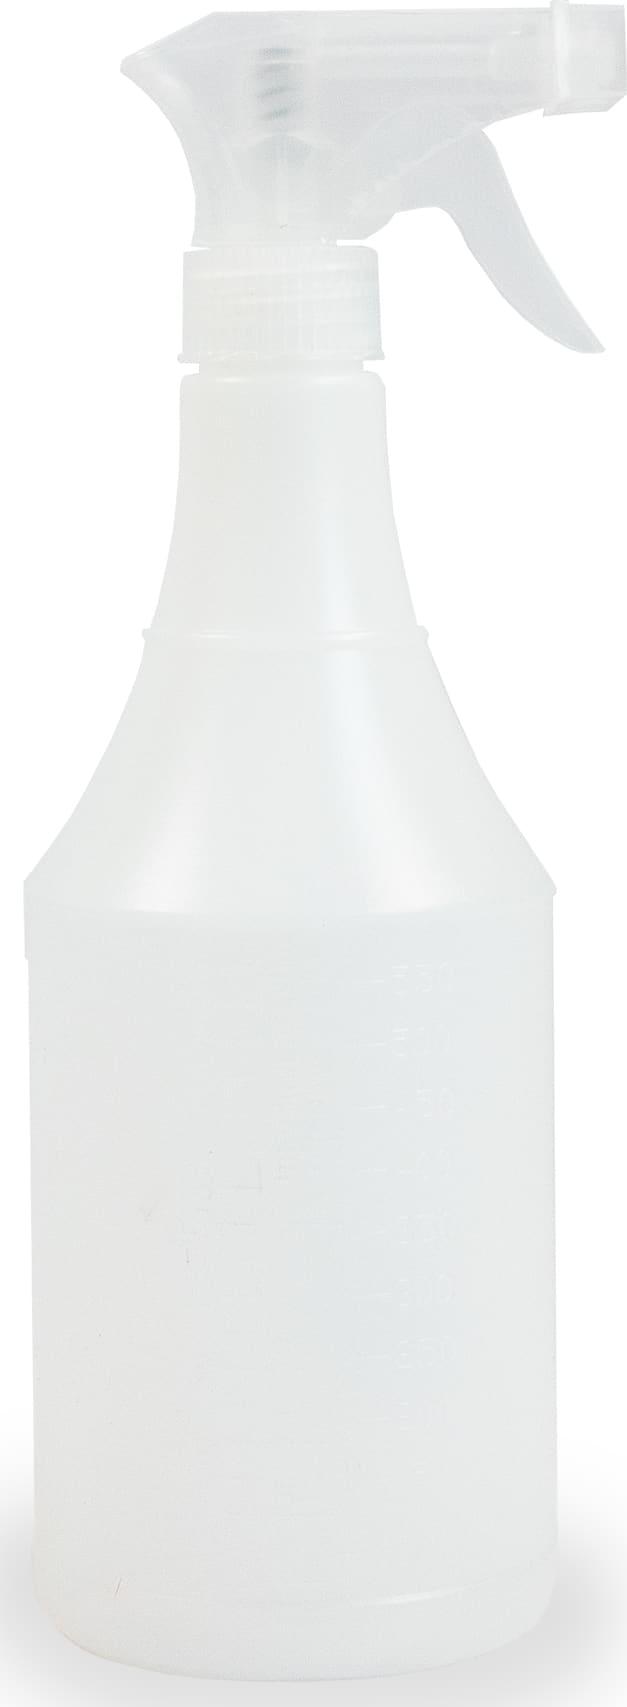 IWHspraybottle-1360081